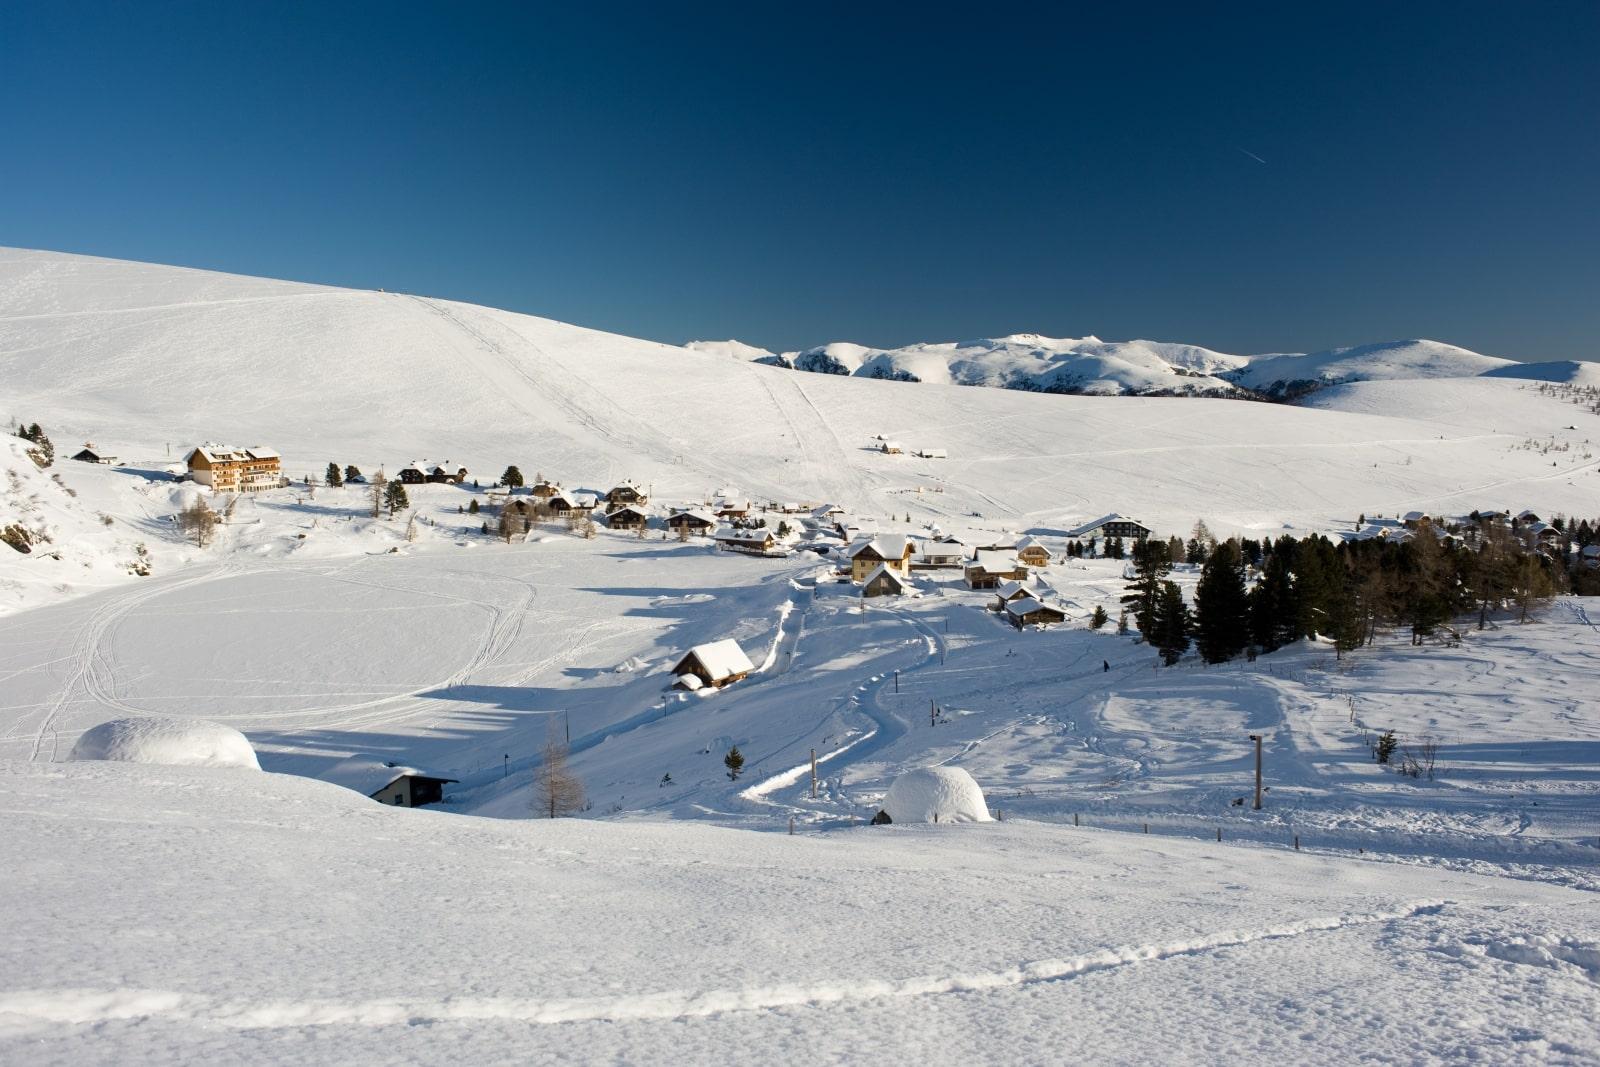 Heidi-Chalet-Falkert-Heidialm-Falkertsee-Hohenloipe-Ski-Winterwandern-See